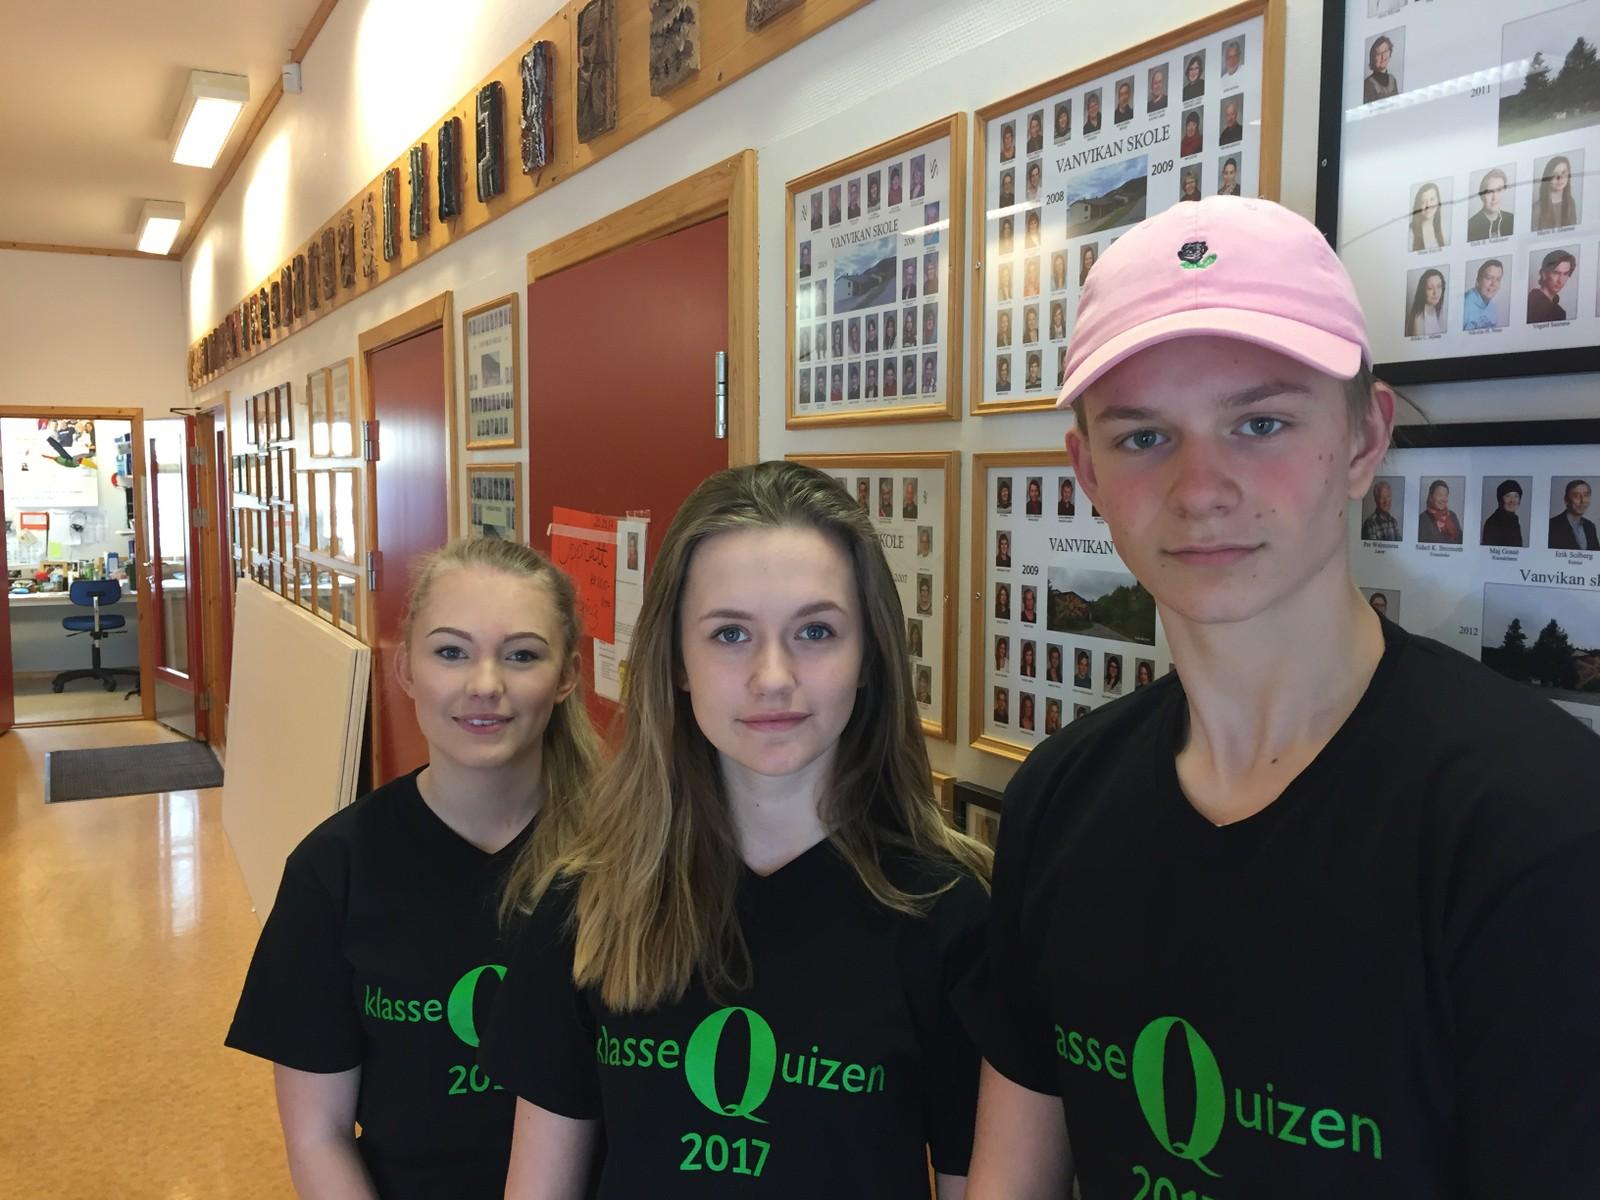 VANVIKAN SKOLE: Fra venstre Vanja Marie Søraas, Sara Clegg og Ludvig Bigset.